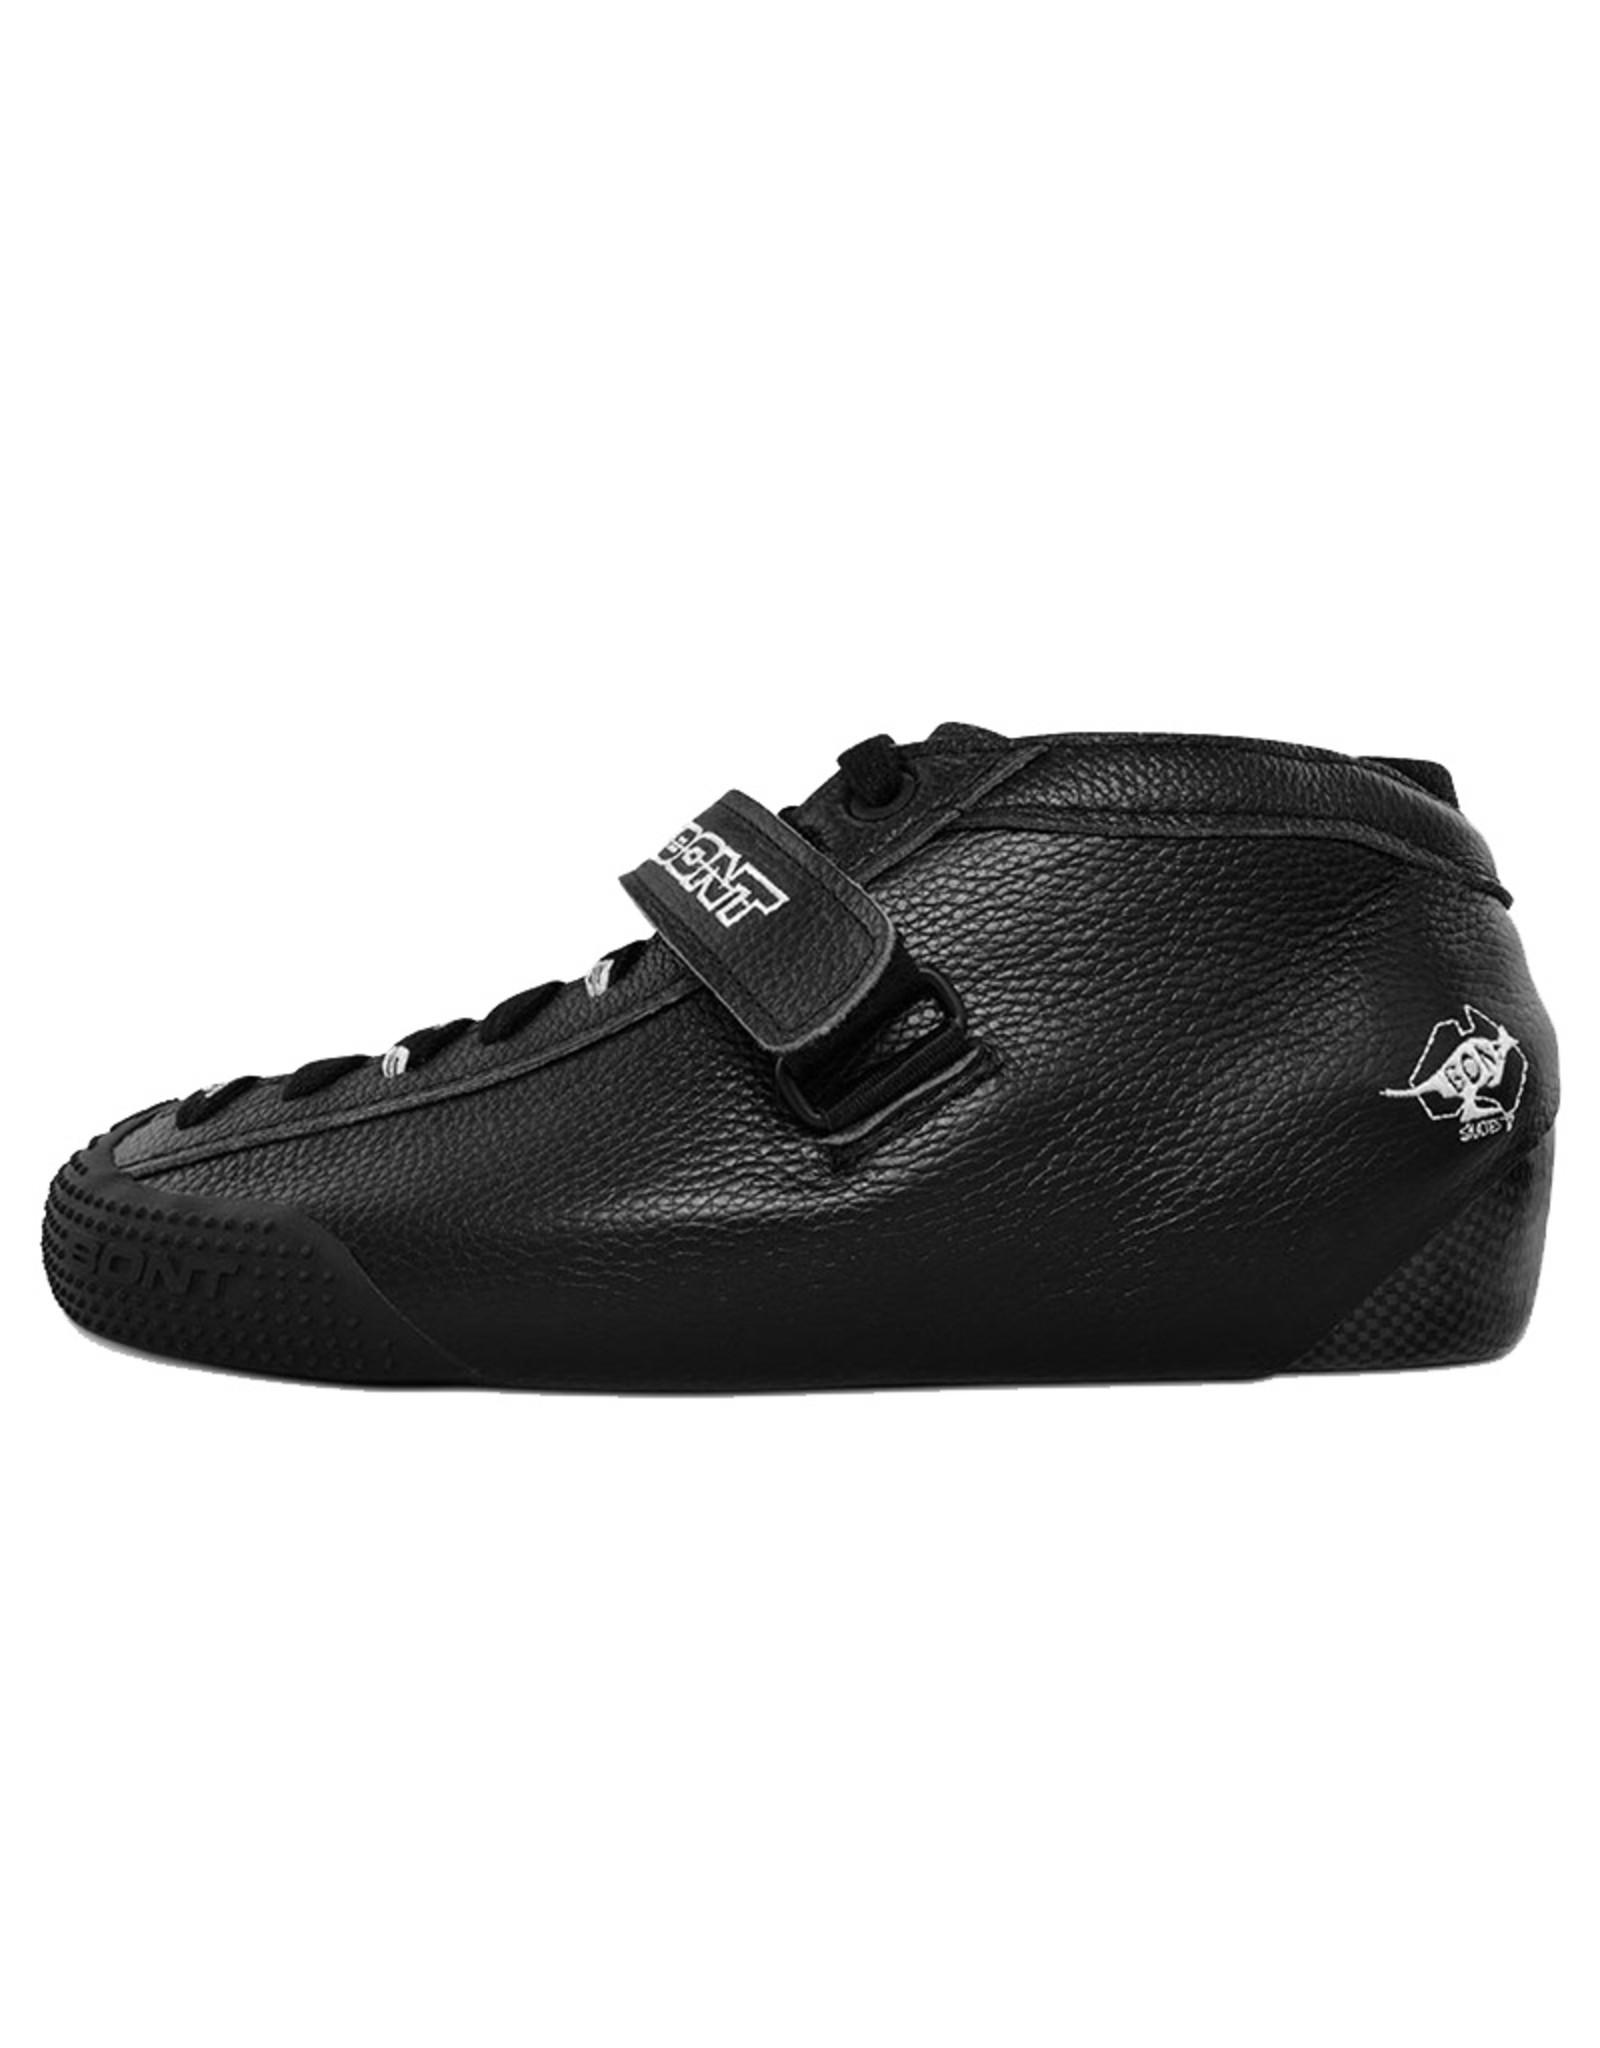 Bont Bont Hybrid Carbon Boot, Leather